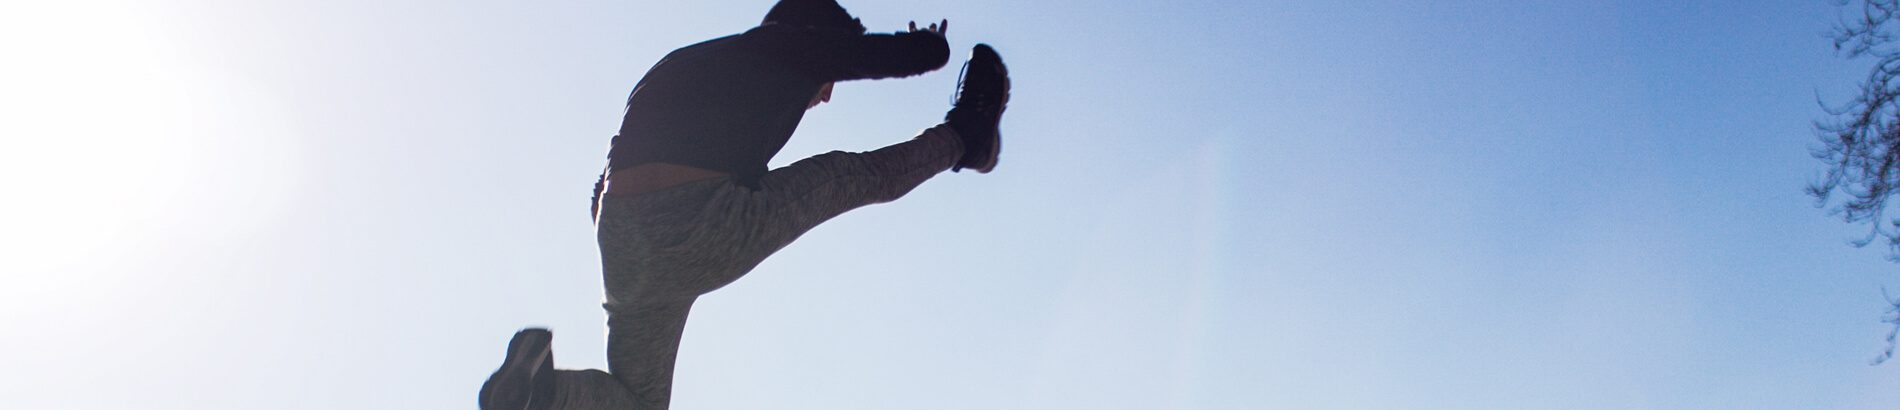 banner-jump2